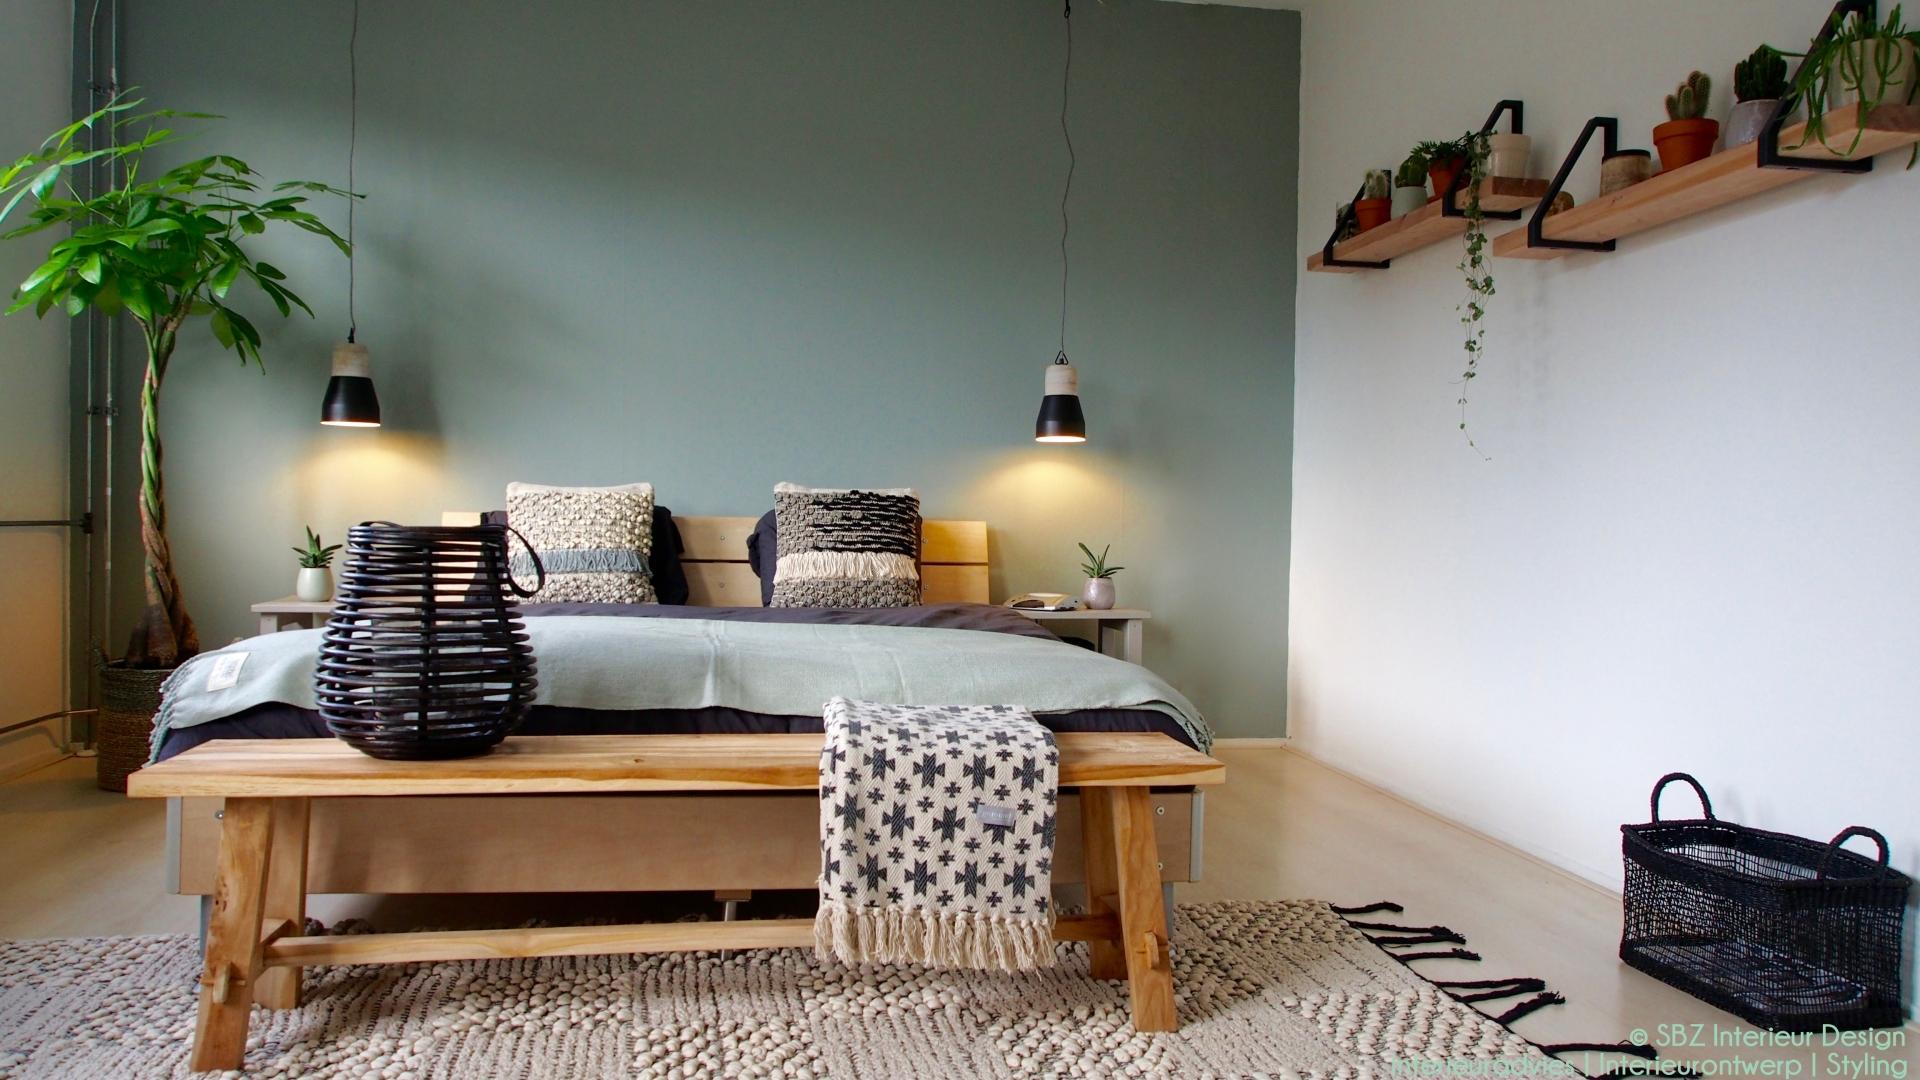 amazing sbz interieur design project inrichting woonblog with kinderkamer inrichting